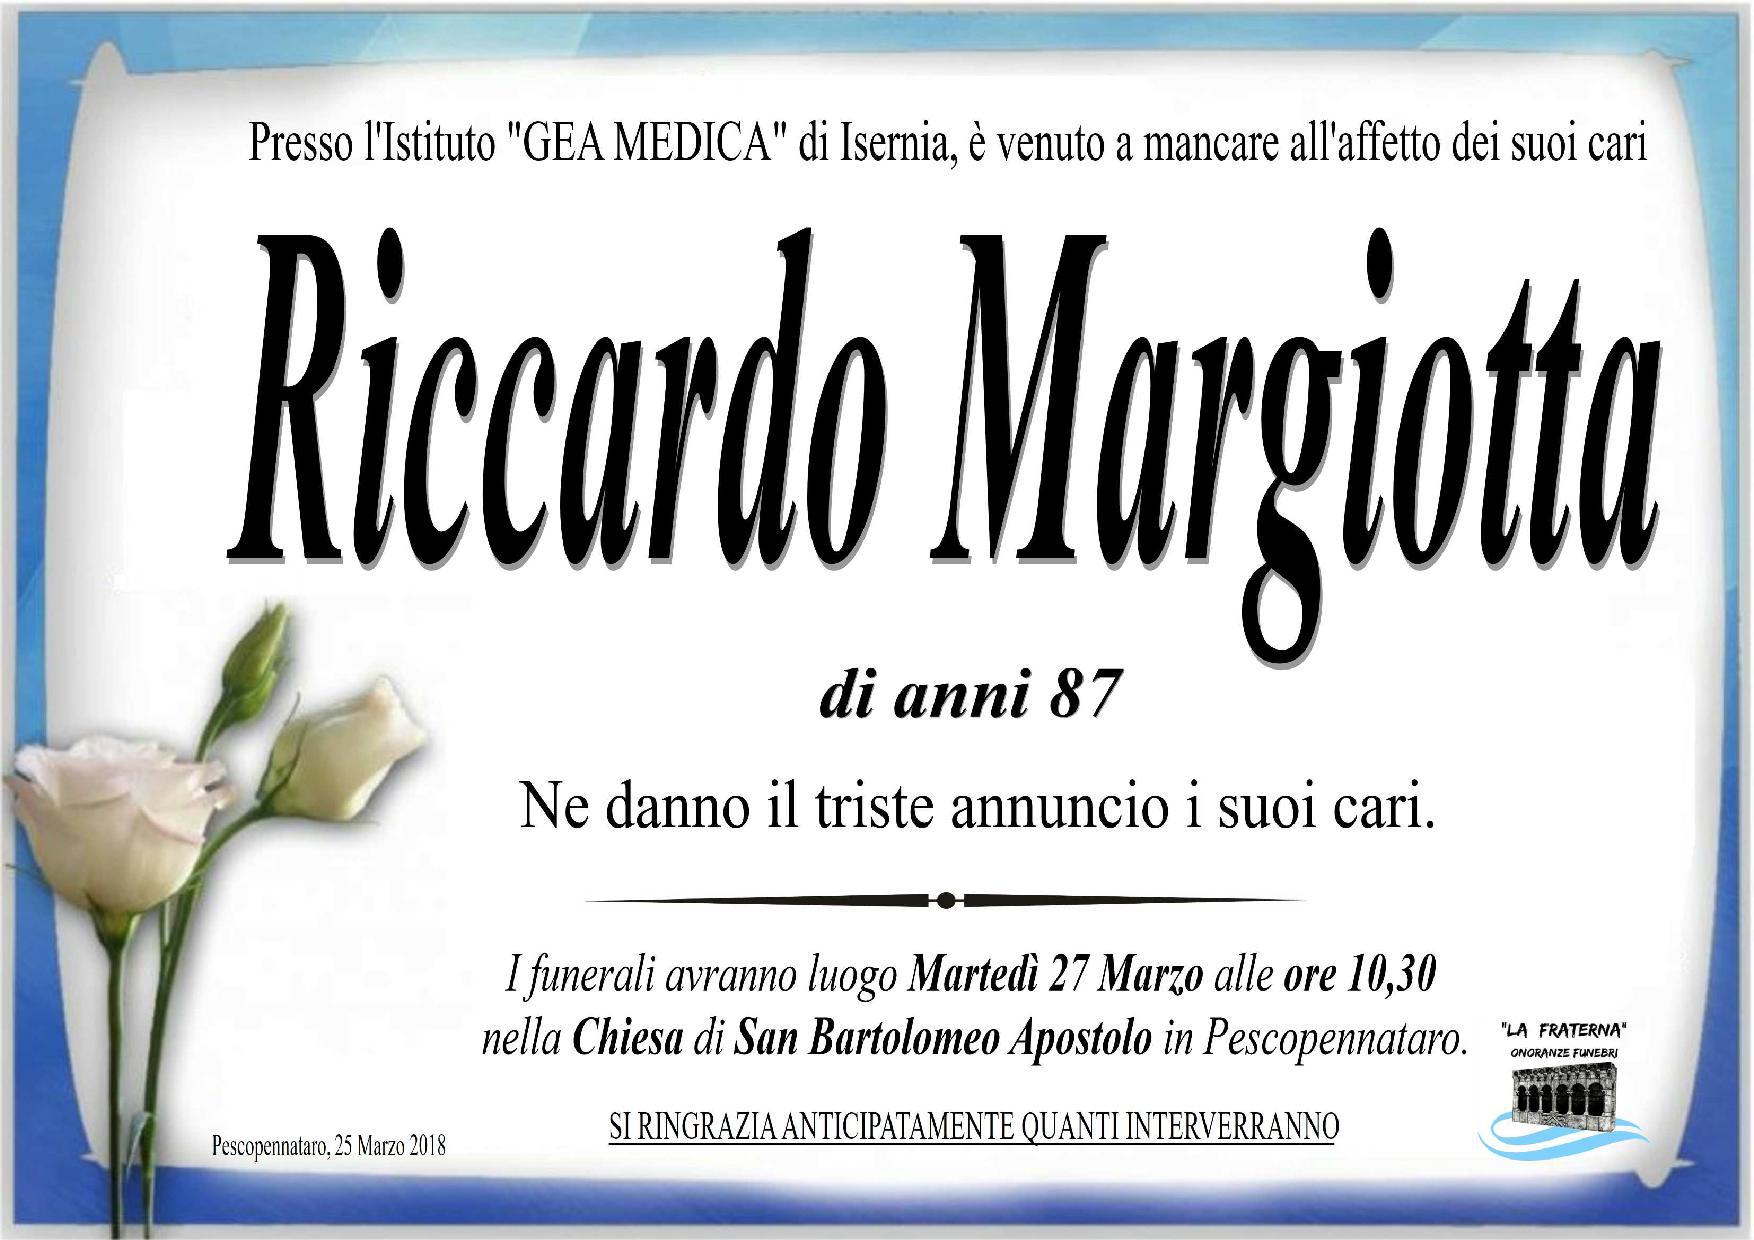 Riccardo Margiotta – 26/03/2018 – Pescopennataro (IS) – Onoranze Funebri La Fraterna